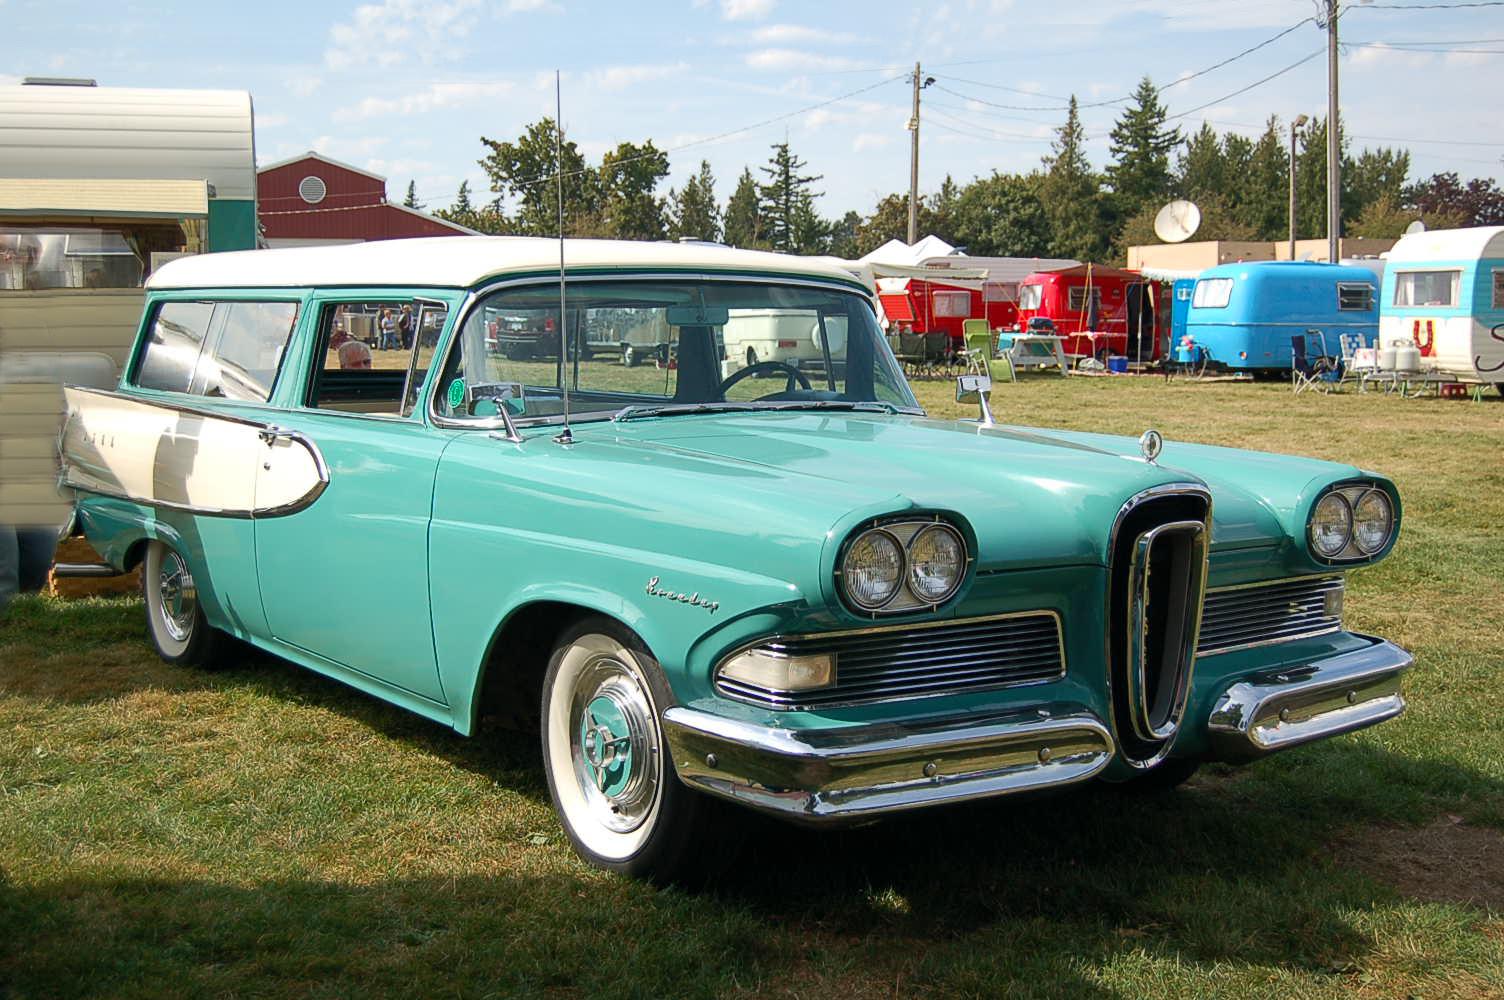 Beautifully restored 1958 edsel roundup 2 door station wagon